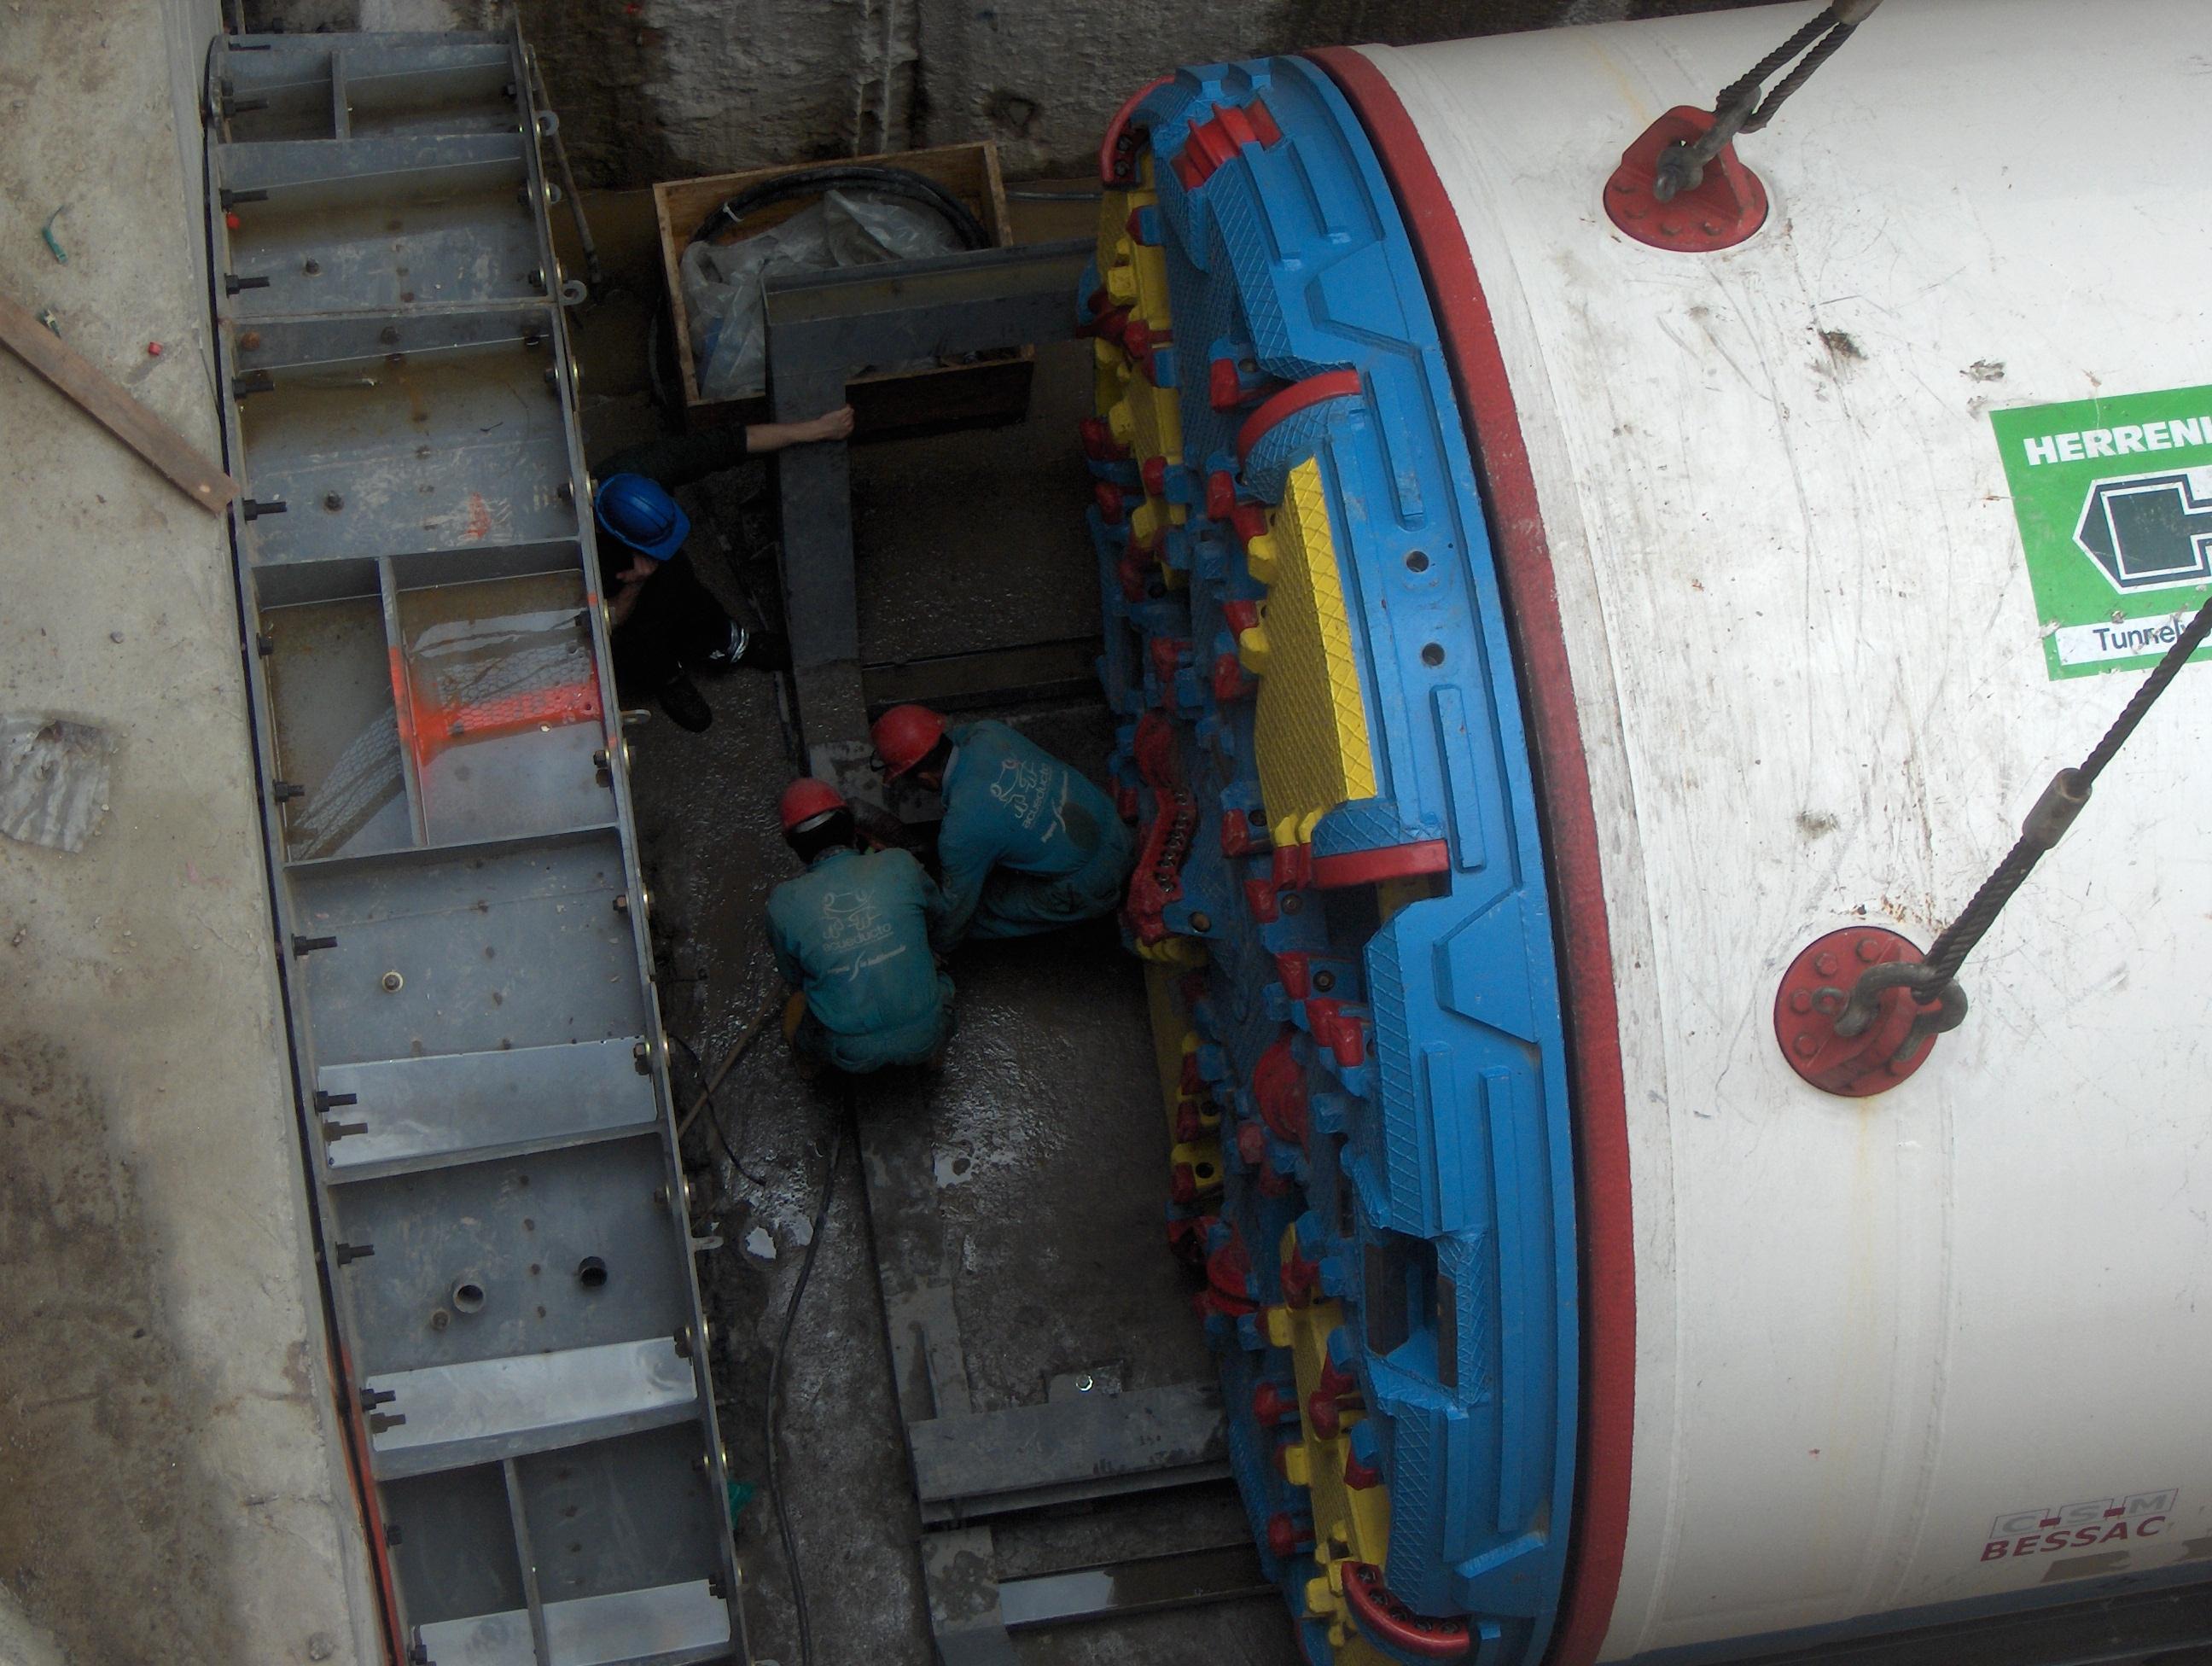 3.-Pozo-de-trabajo-Interceptor-Fucha-Tunjuelo.-Bogotá-D.C.-Cundinamarca